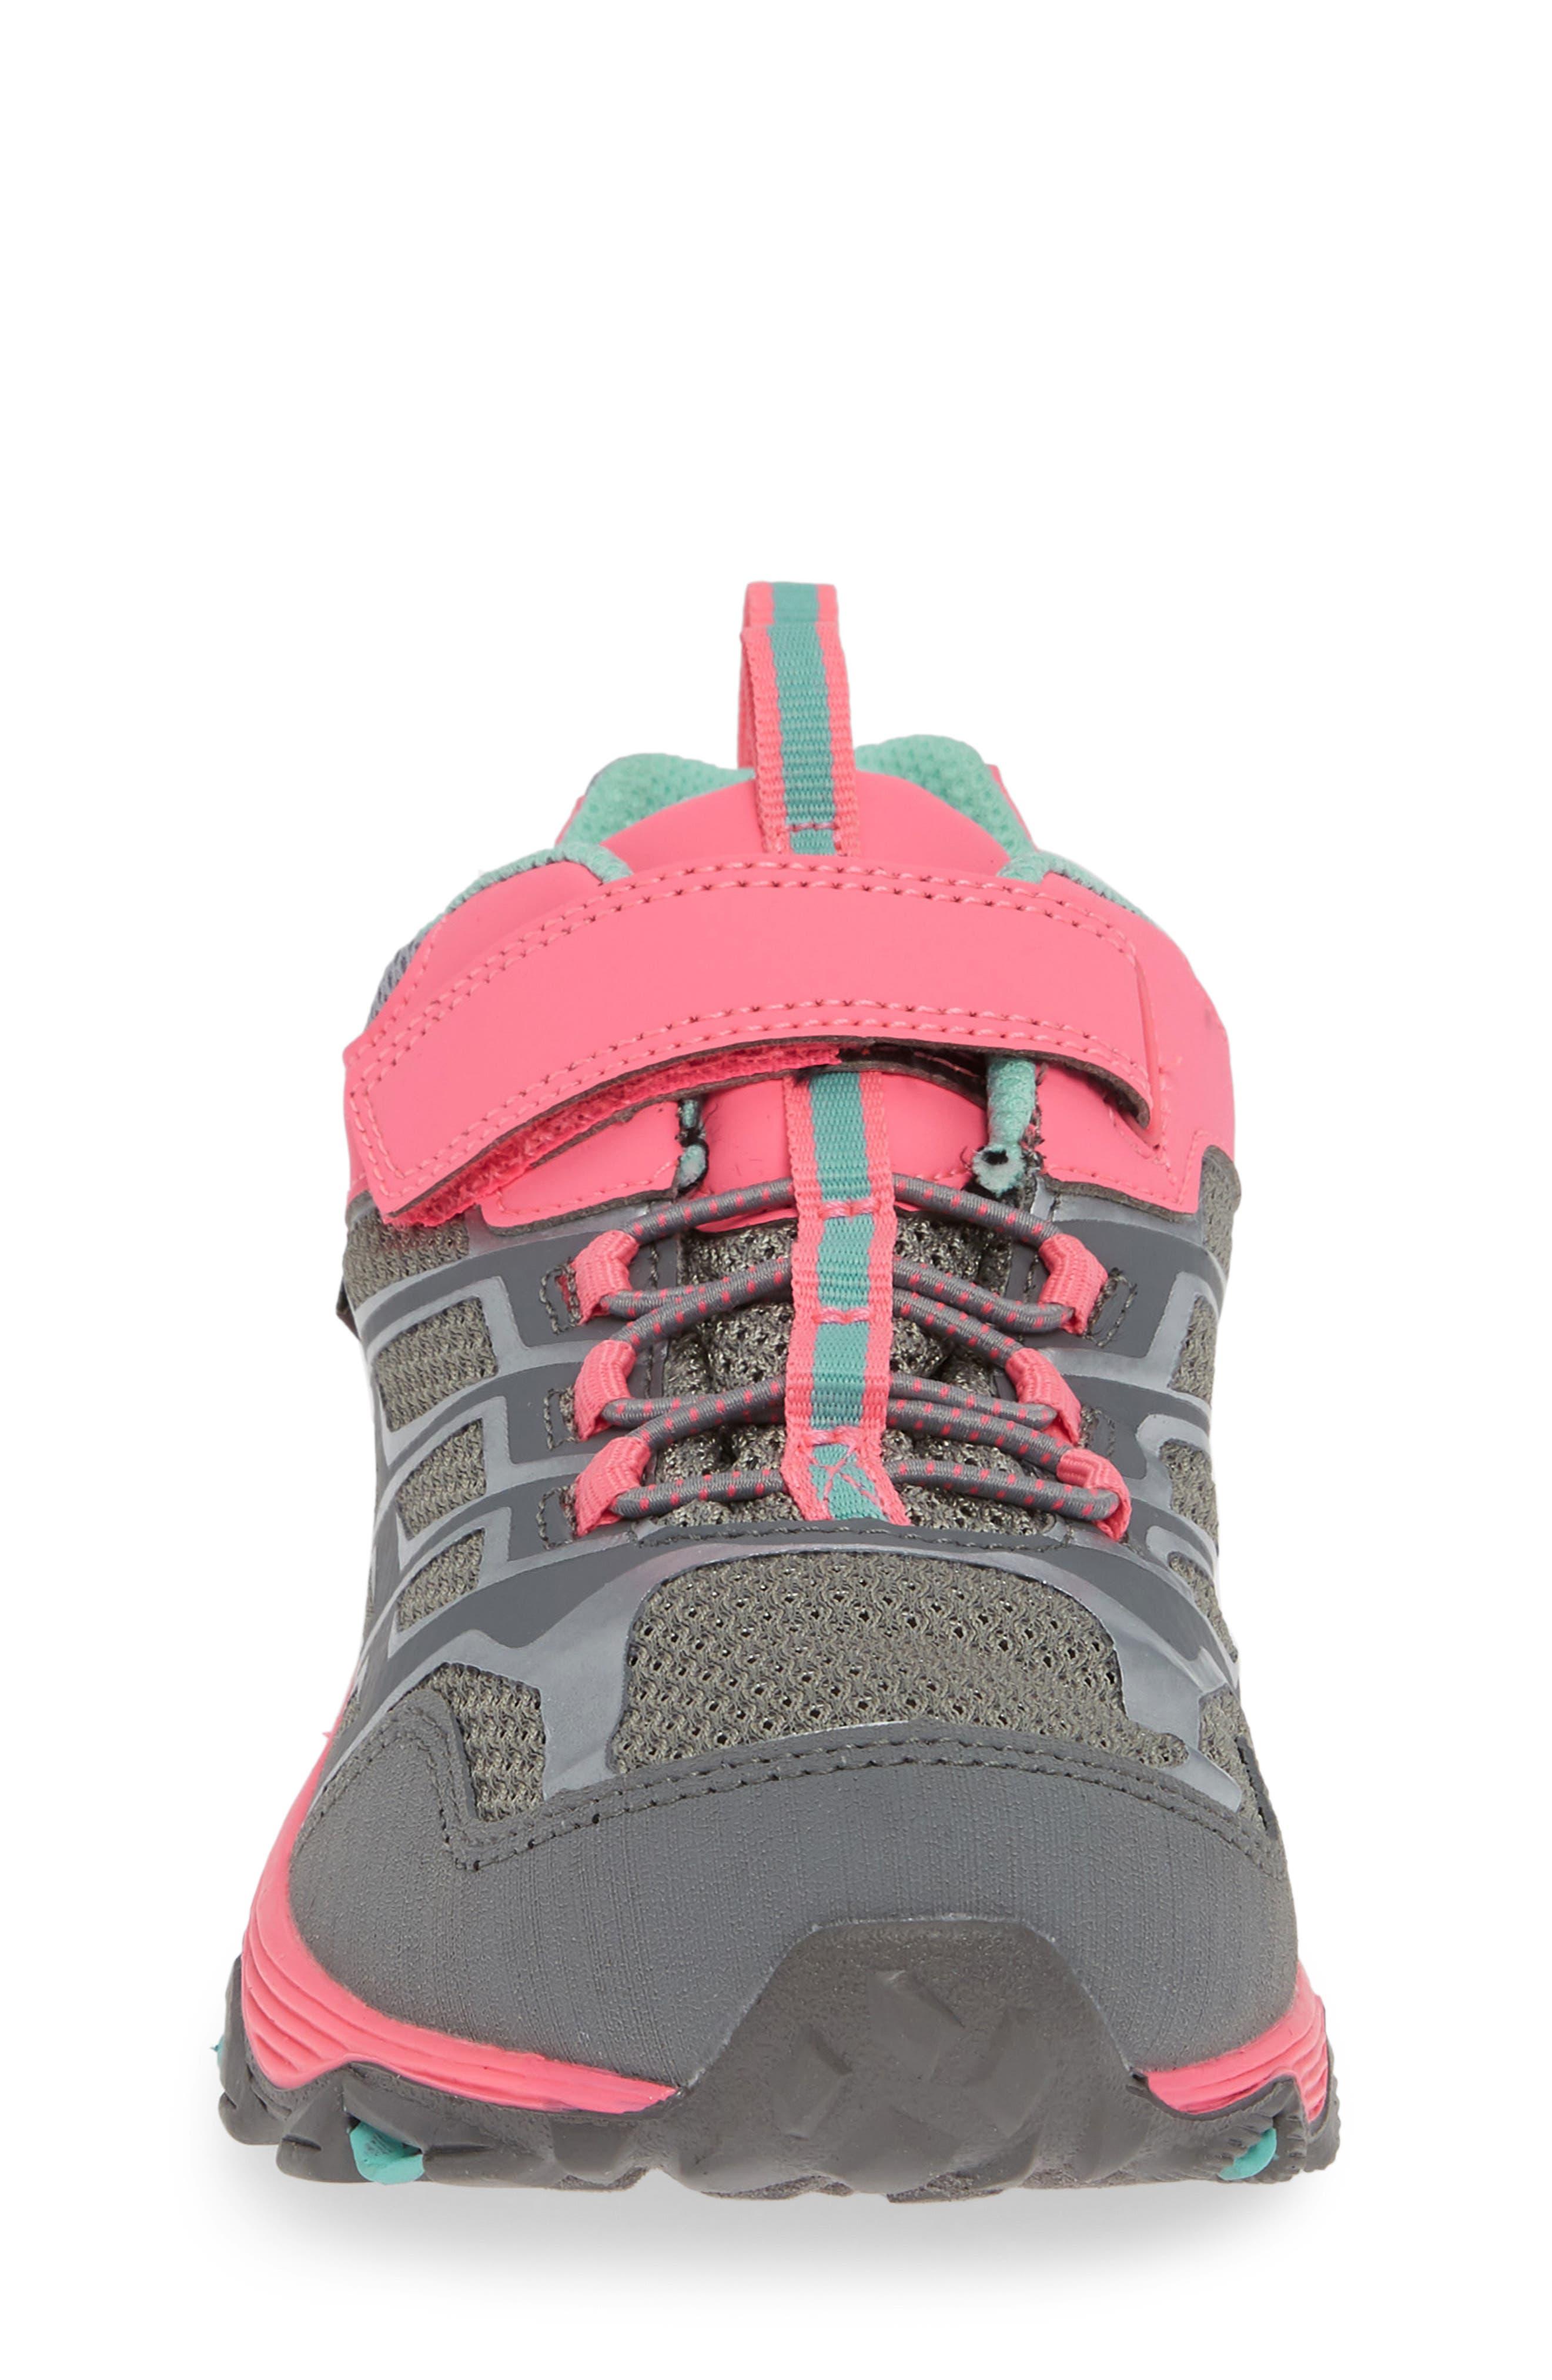 Moab FST Polar Low Waterproof Sneaker,                             Alternate thumbnail 4, color,                             GREY/ CORAL